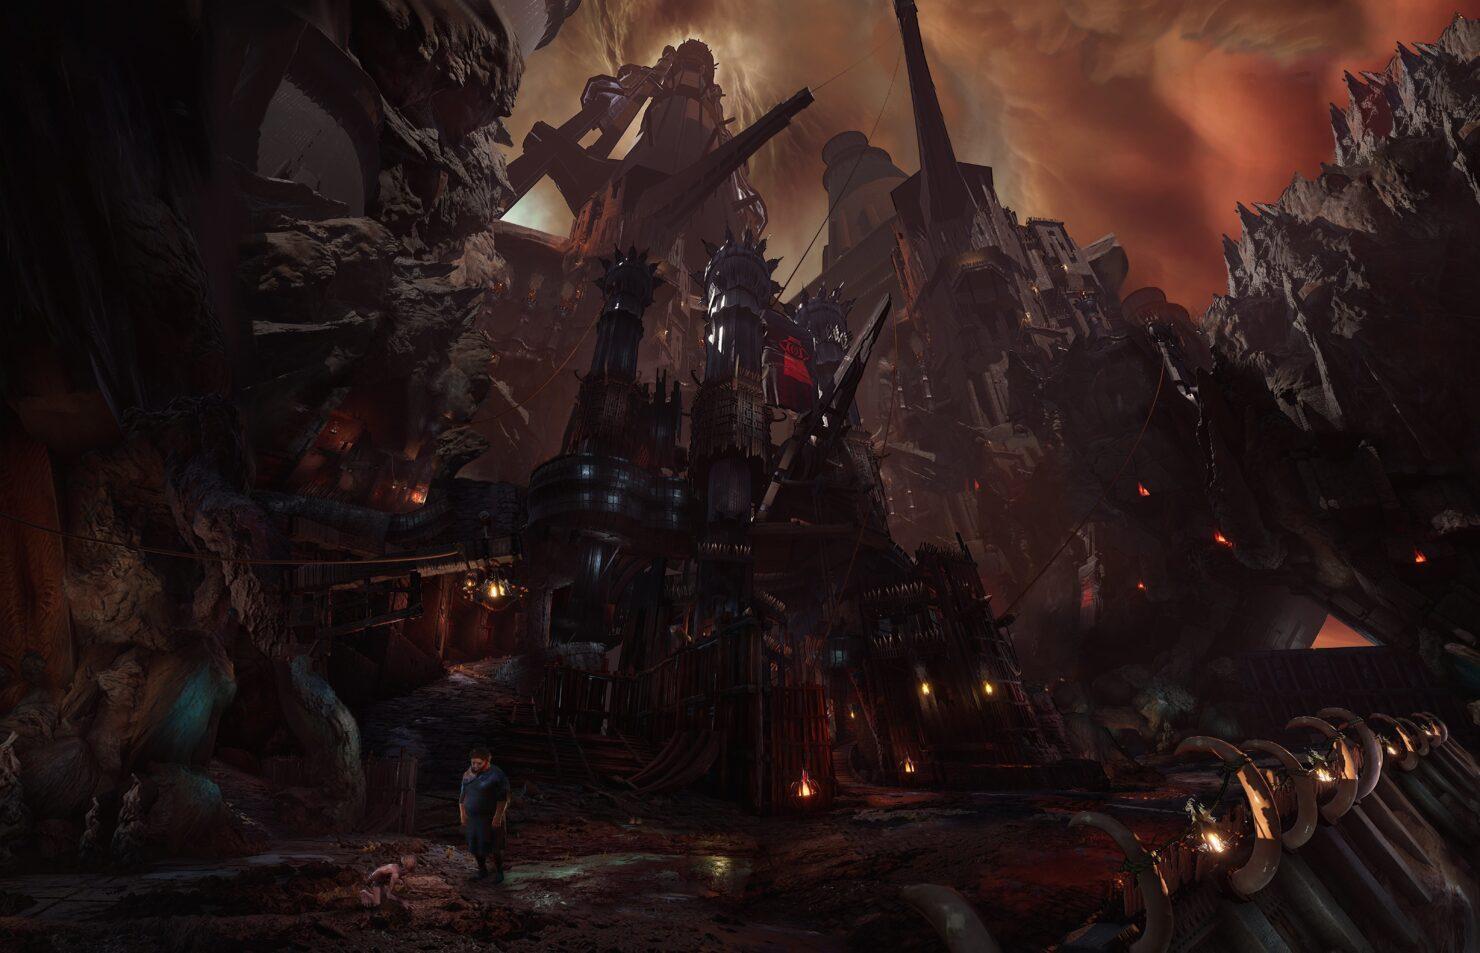 Daedalic показала первые скриншоты The Lord of the Rings: Gollum 2